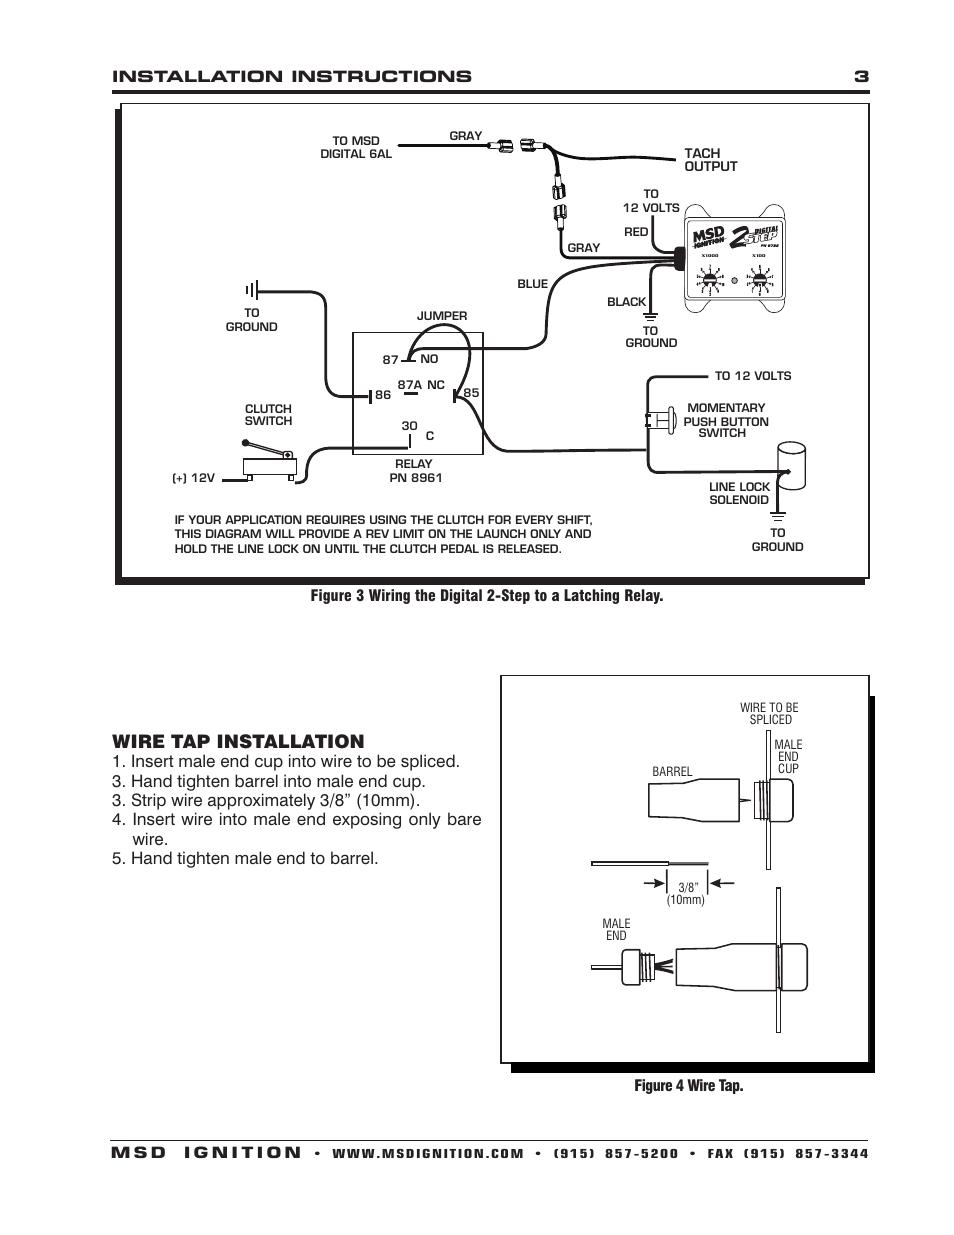 Mazda B2200 Sunpro Tach Wiring Free Diagram For You Drag Specialties 2211 0103 Tachometer 52 In Samurai Super